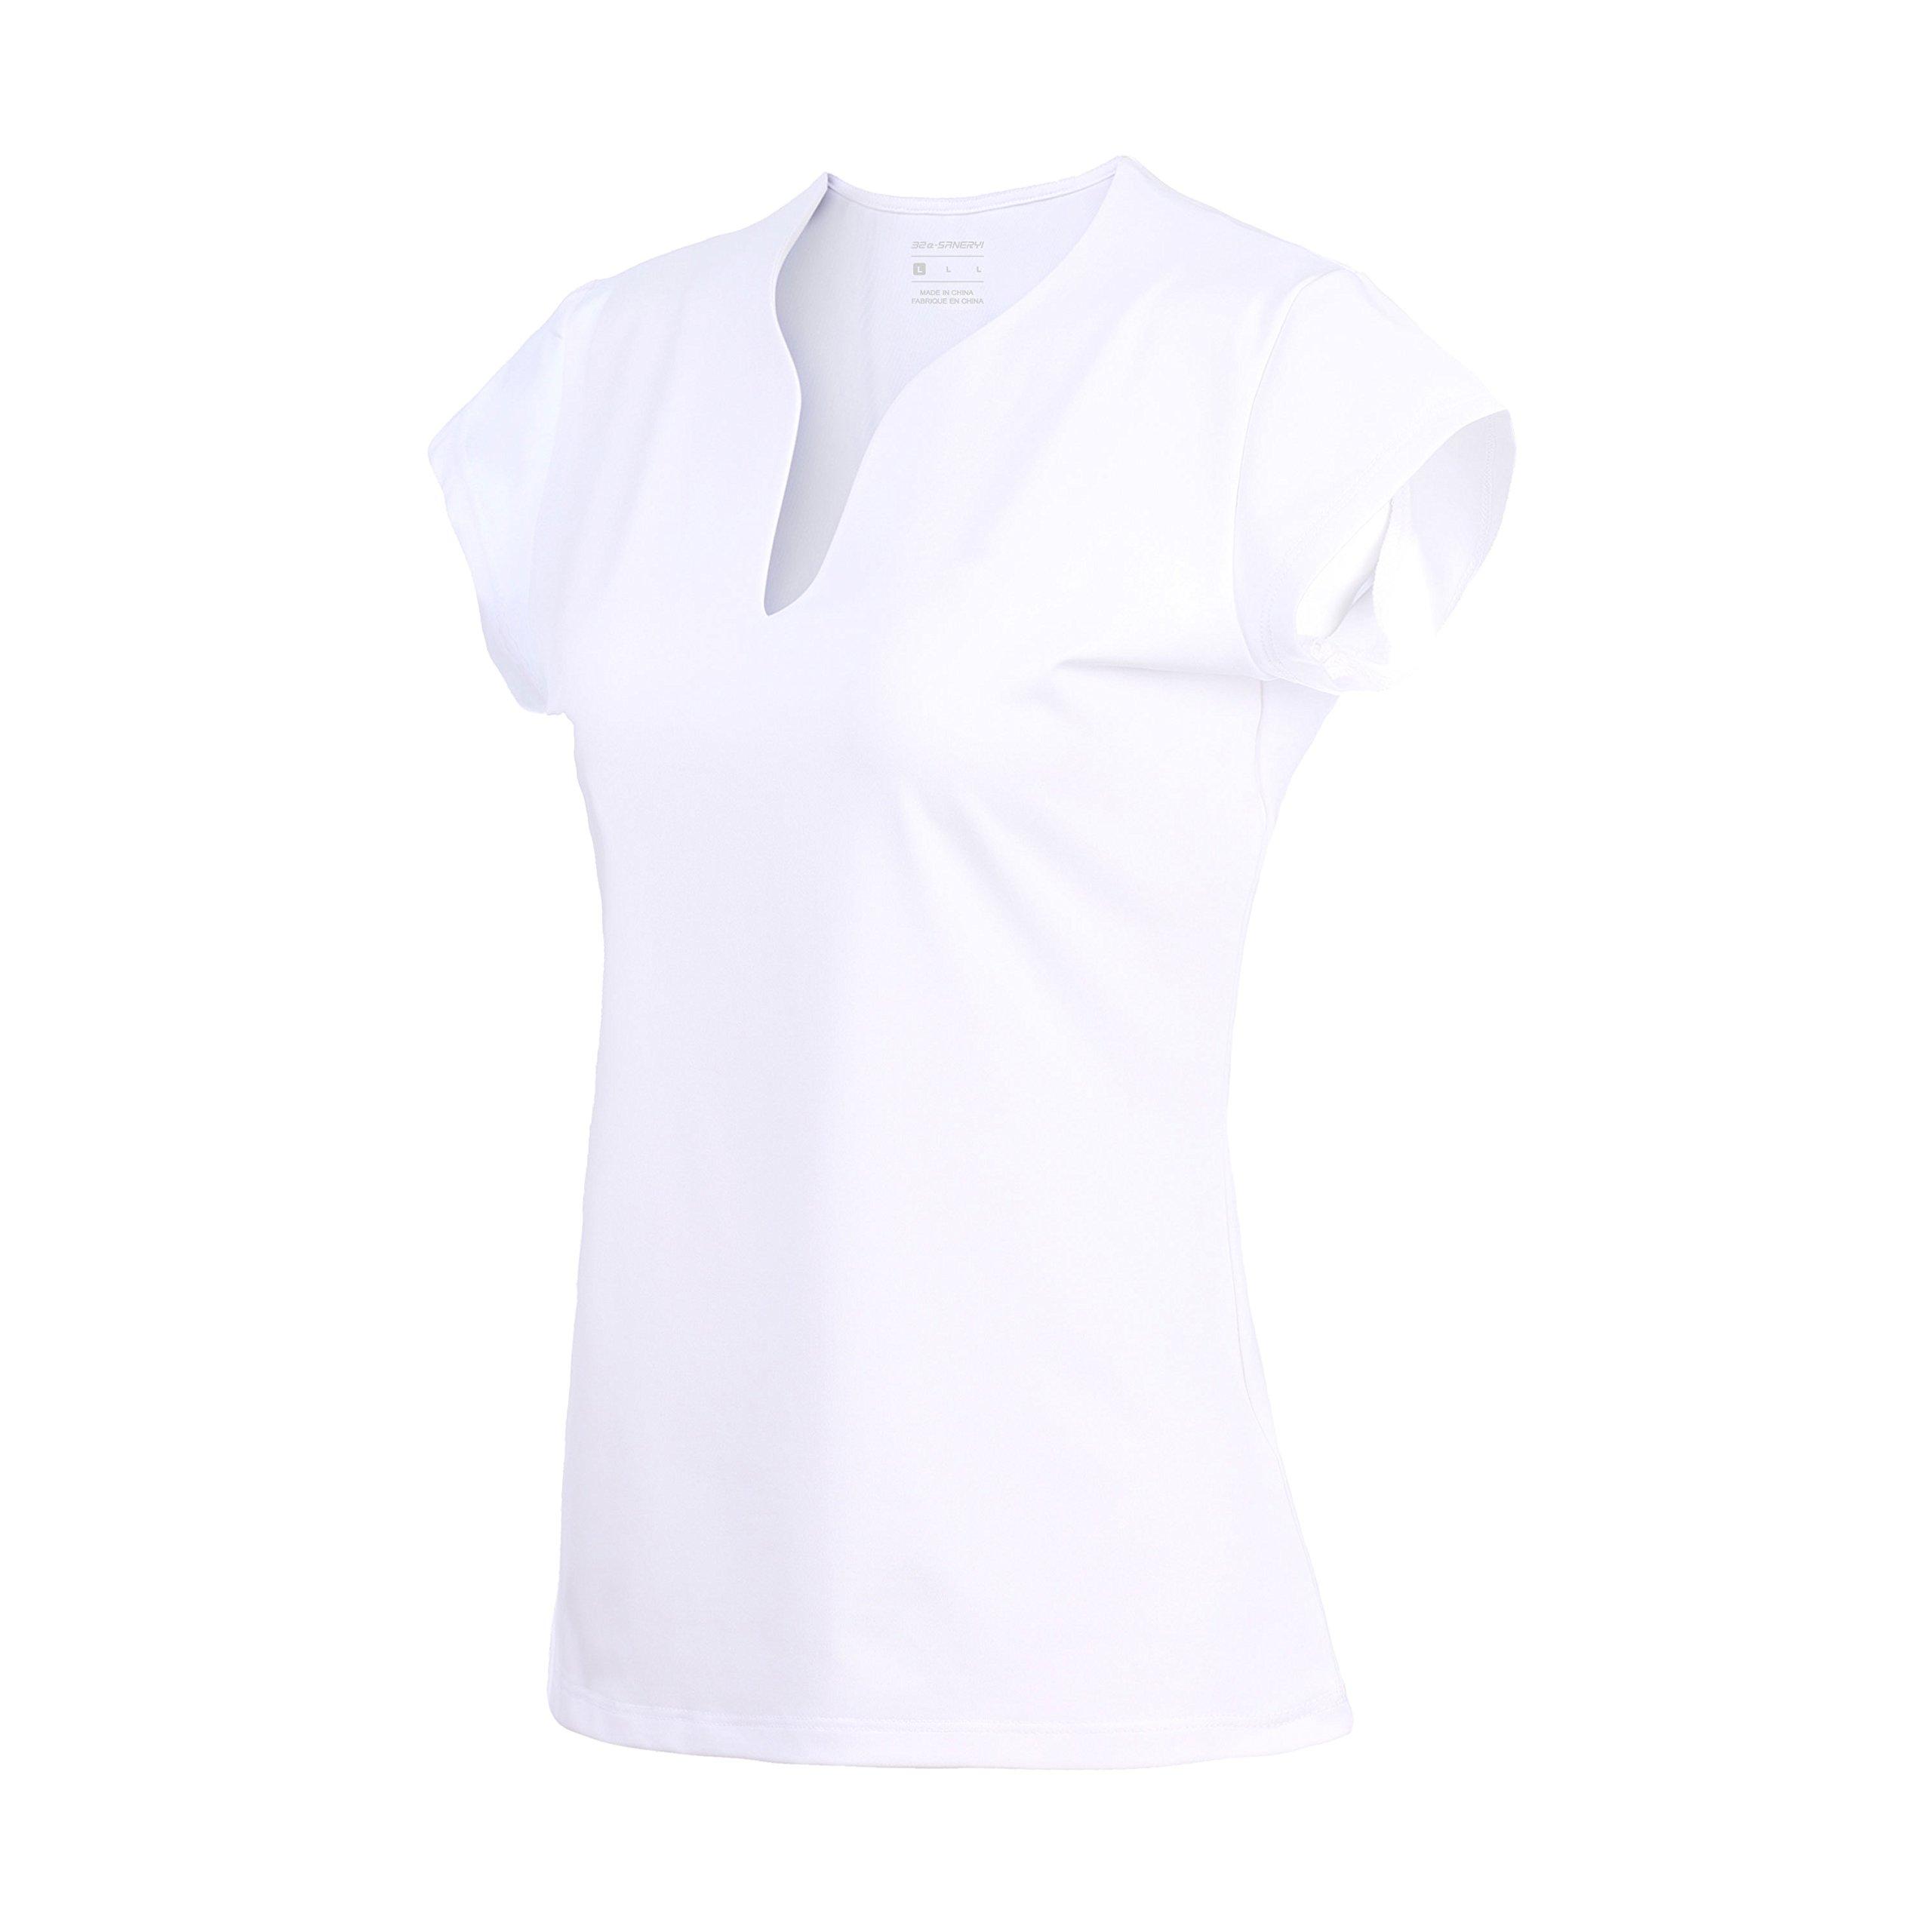 Women's Quick-Drying V-Neck Short Sleeve Tops, Golf Shirts (t42,S,White)